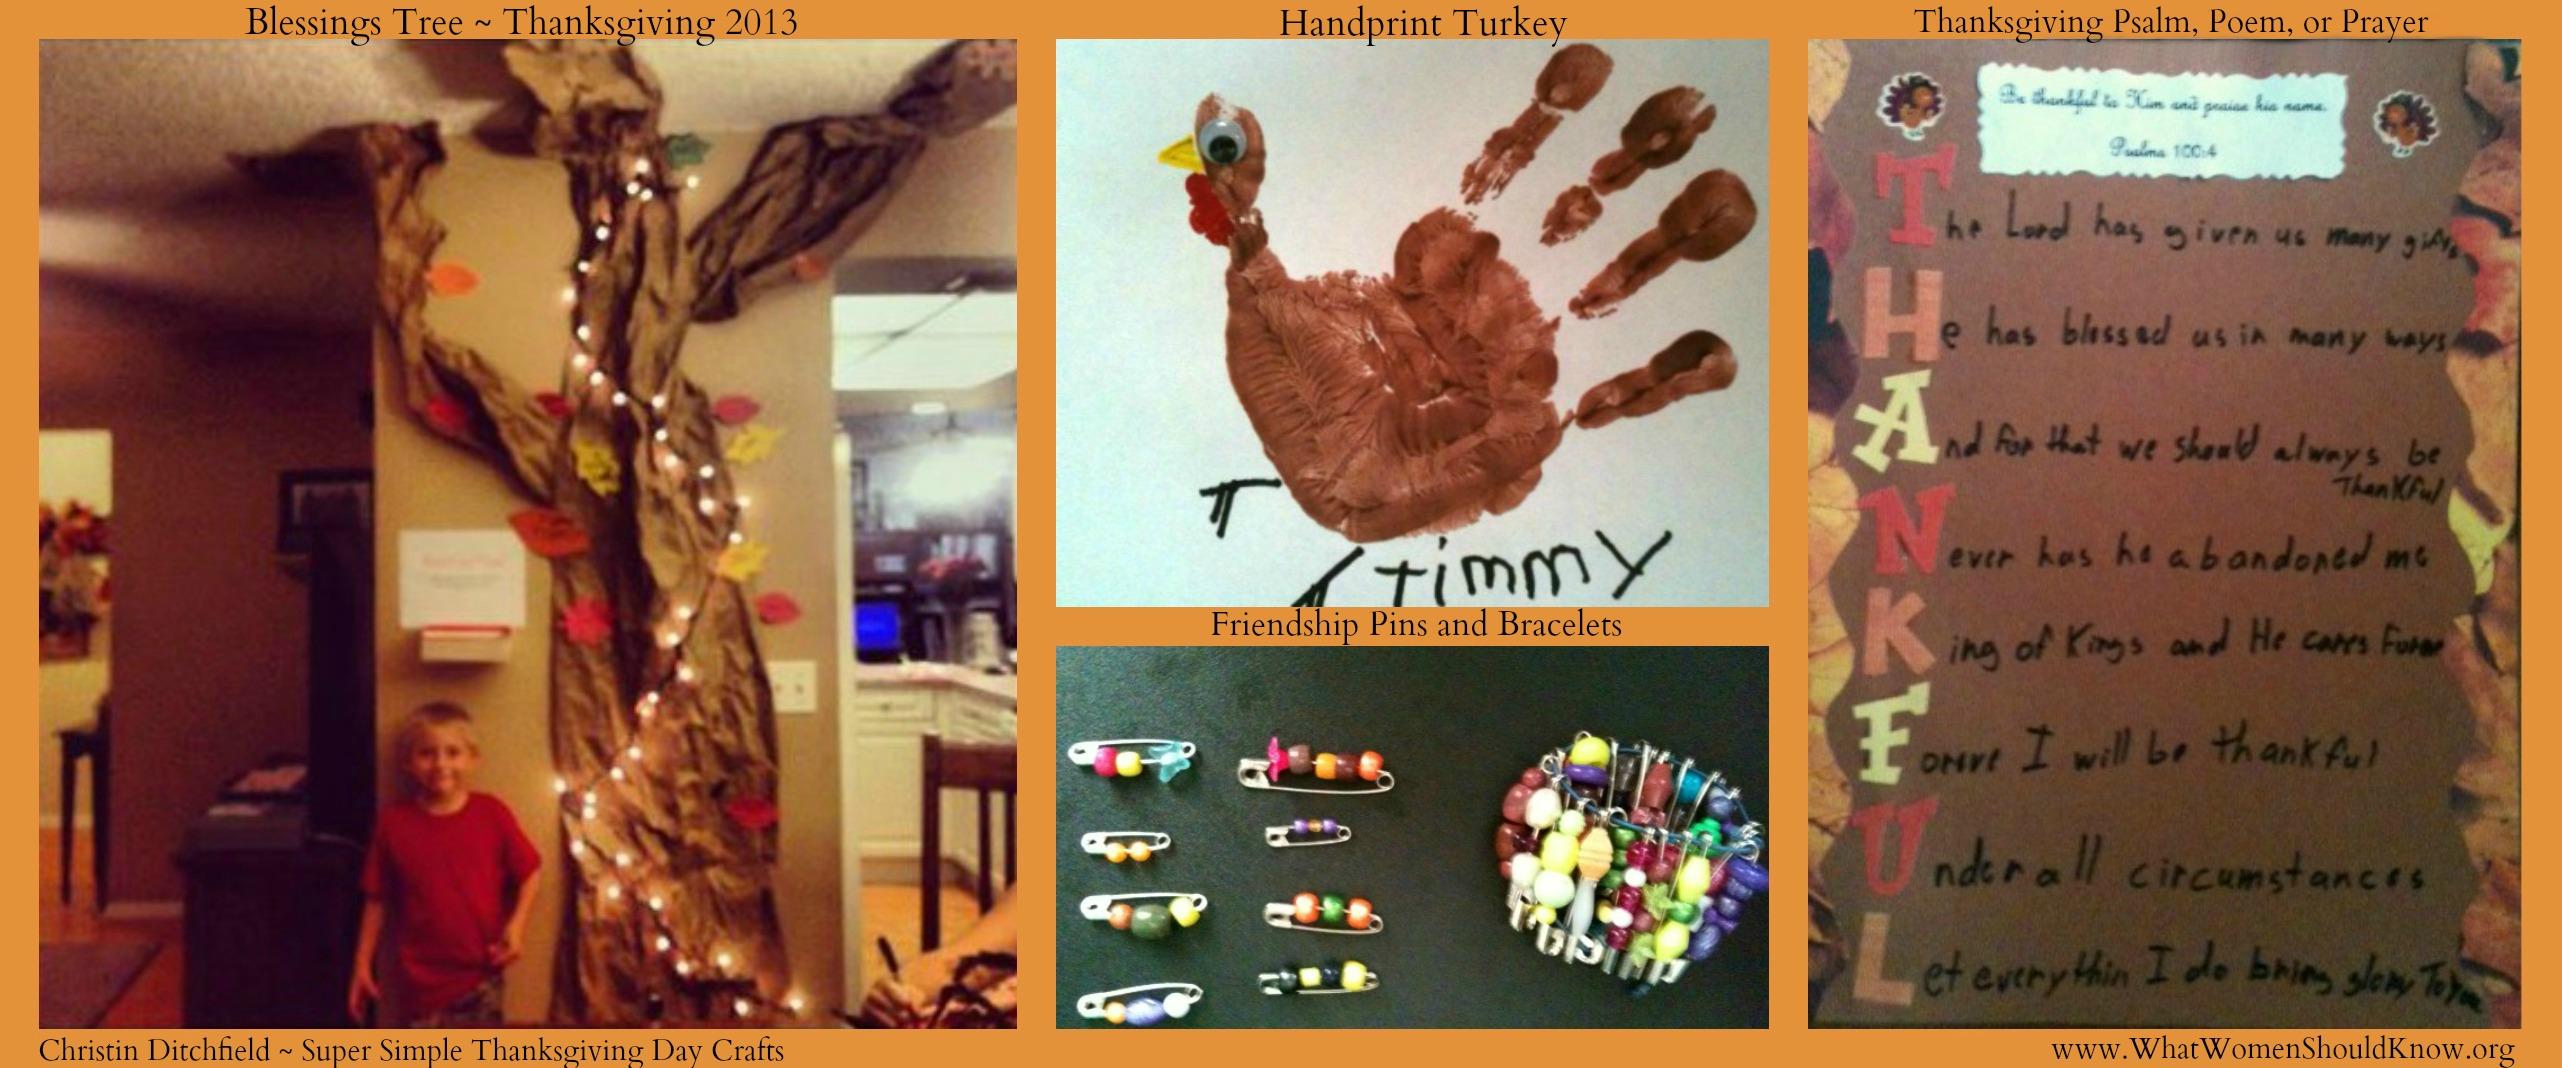 Thanksgiving Crafts Collage